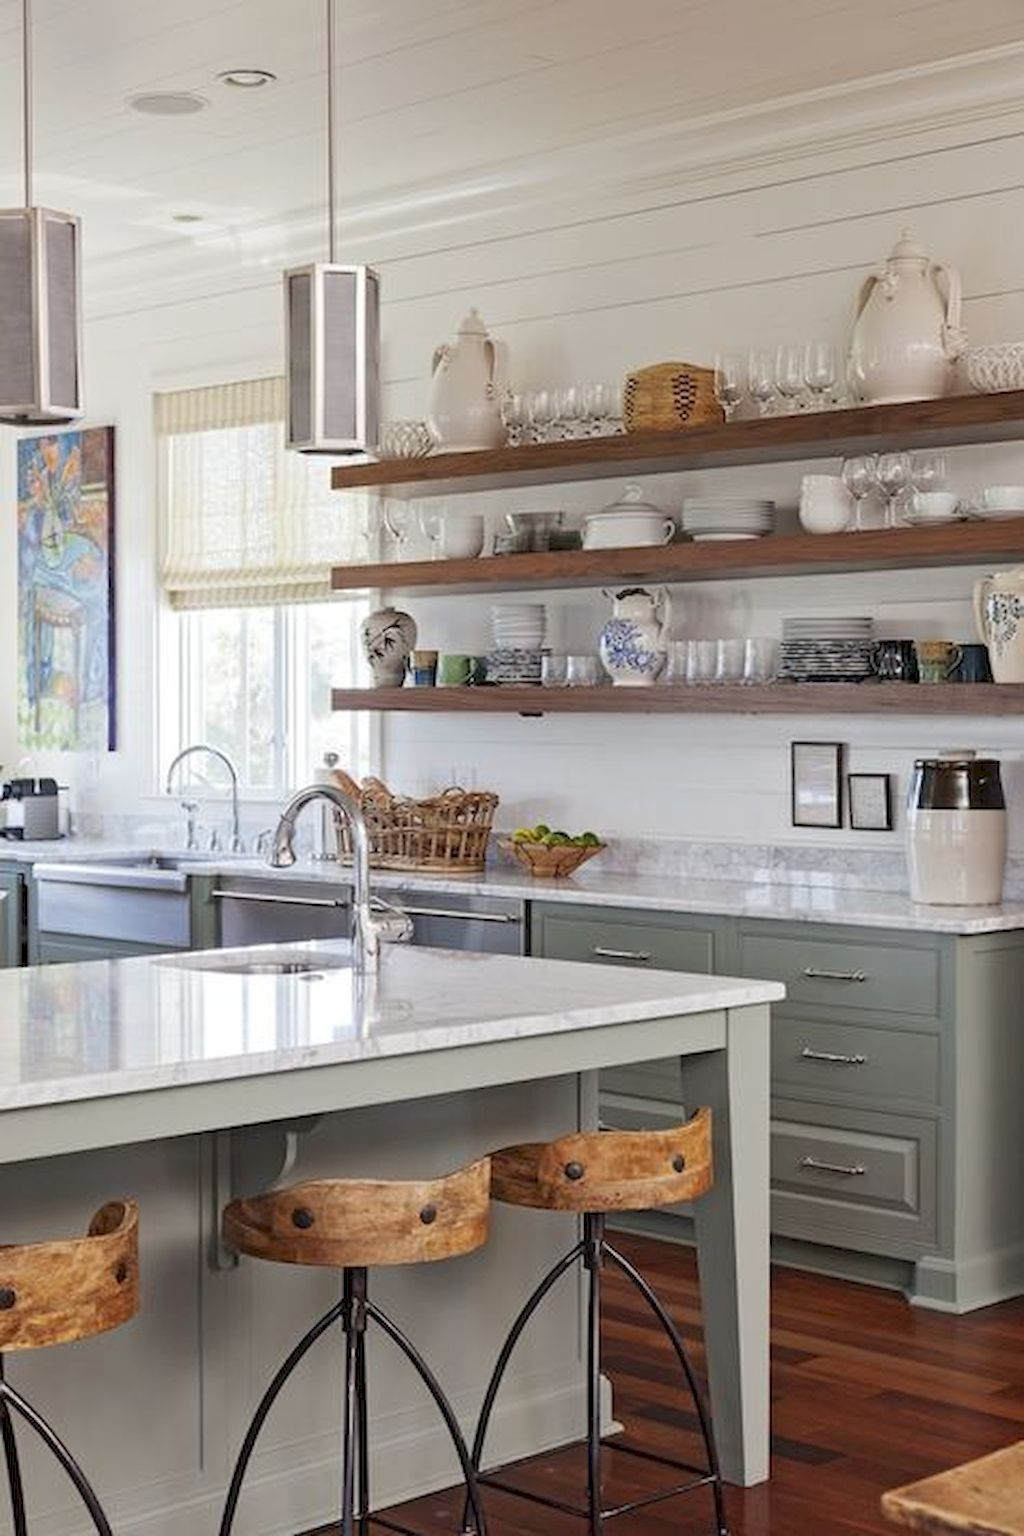 90 rustic kitchen cabinets farmhouse style ideas 36